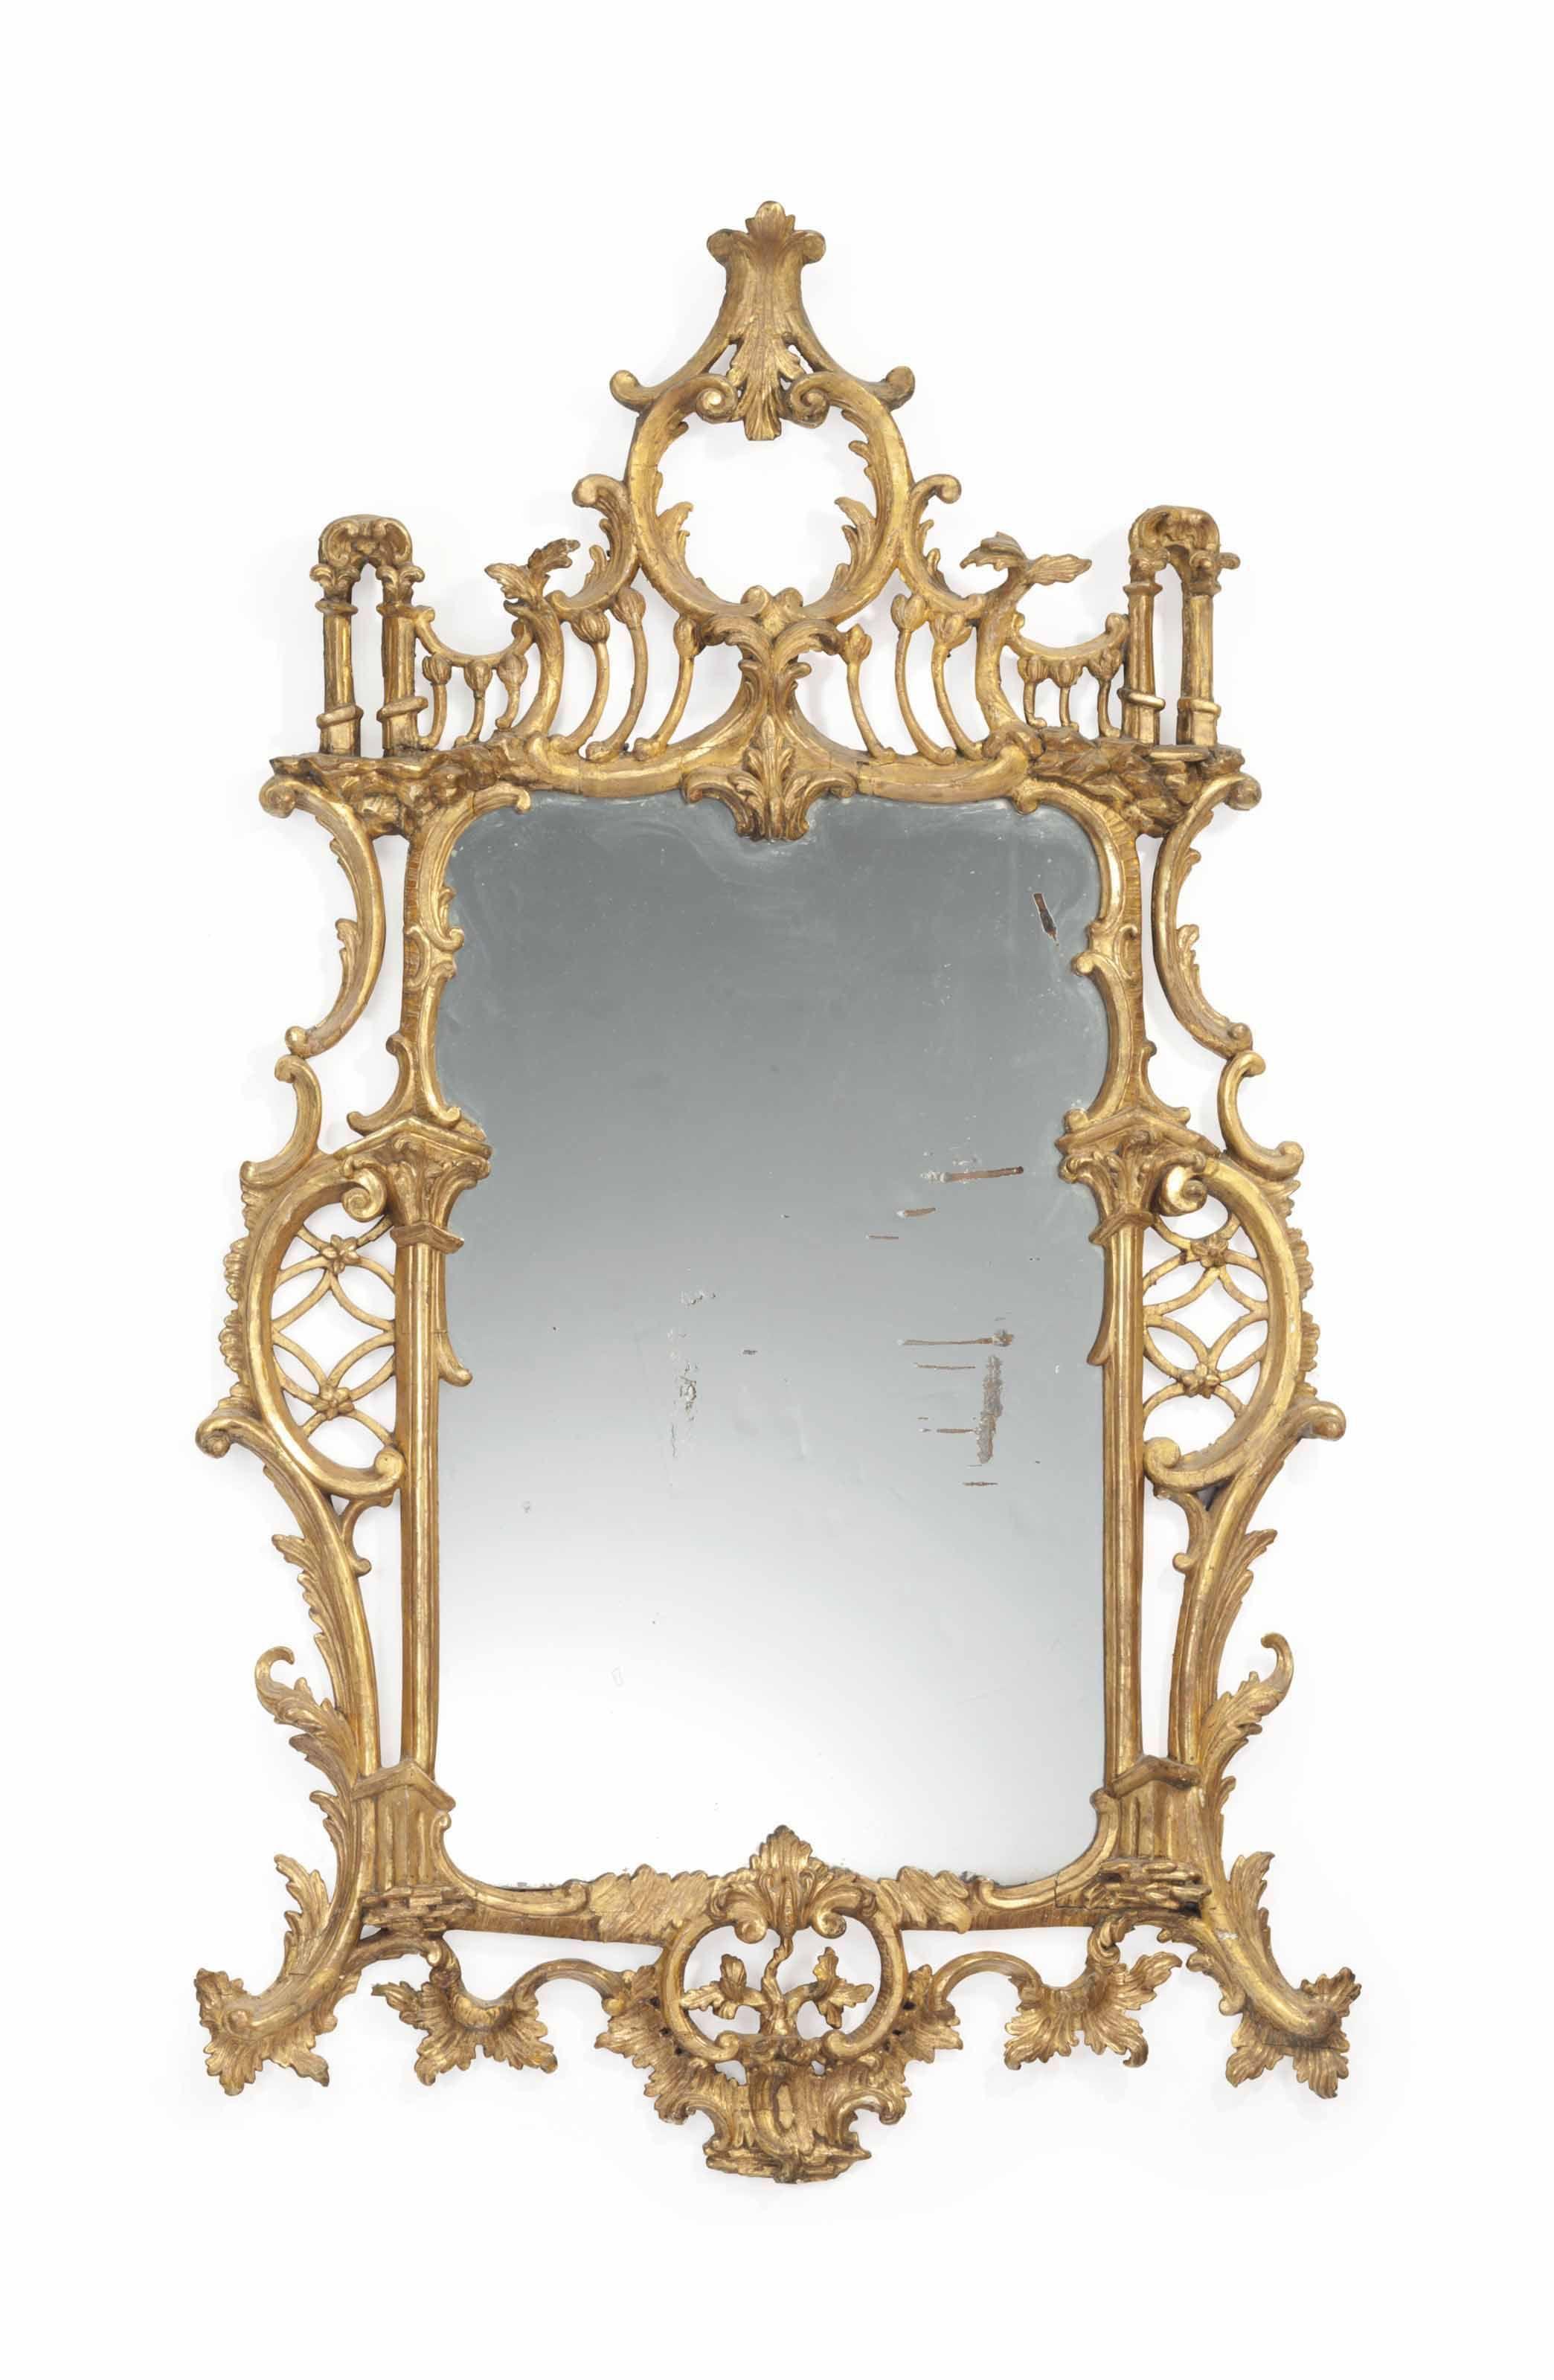 mirror dating ireland